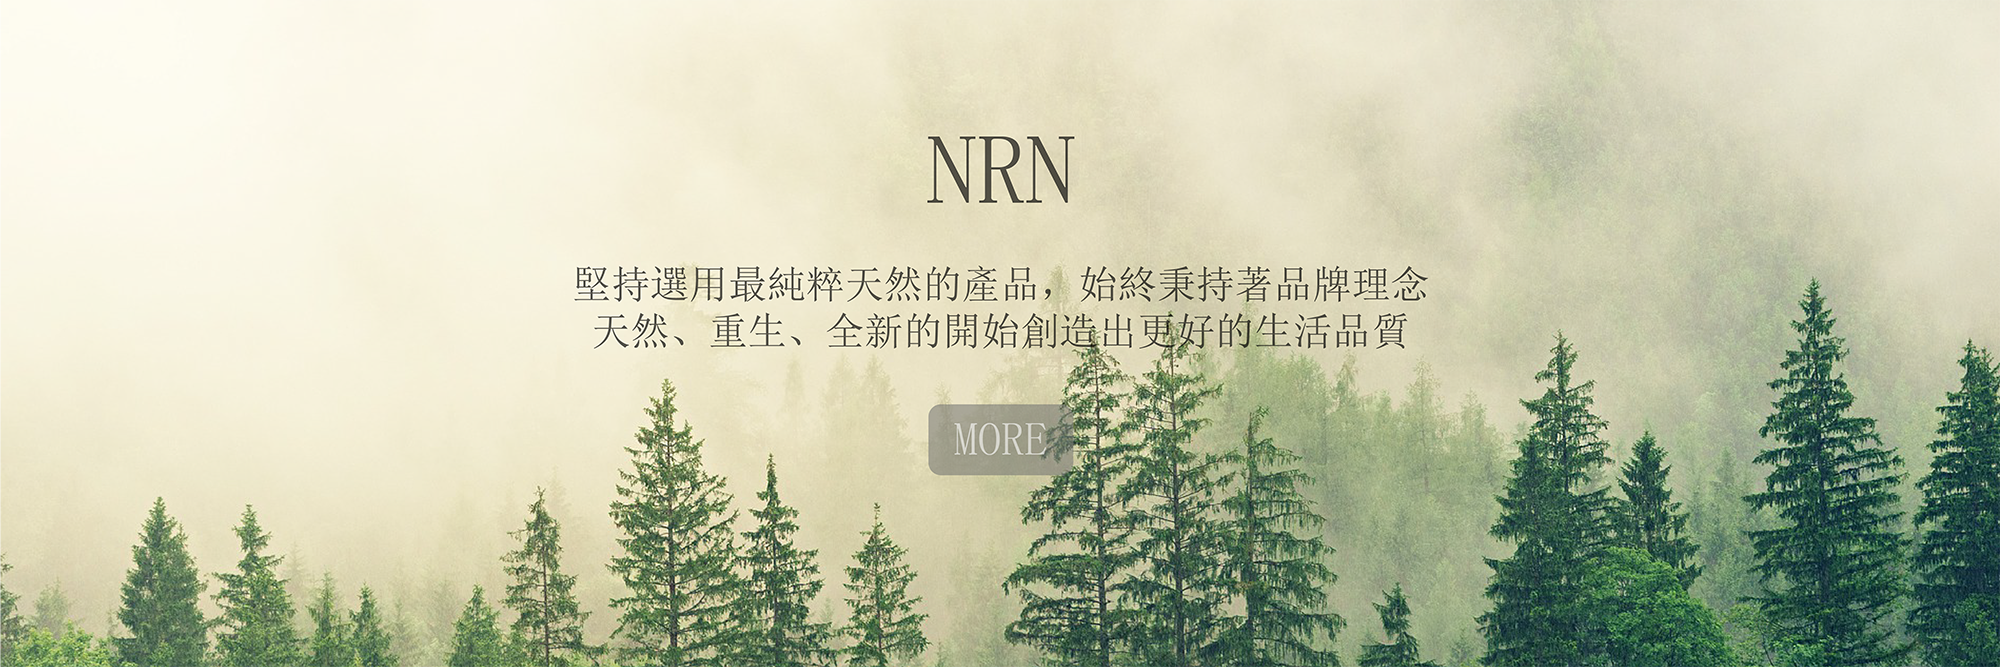 NRN|堅持選用最純粹天然的產品,始終秉持著品牌理念,天然、重生、全新的開始創造出更好的生活品質。